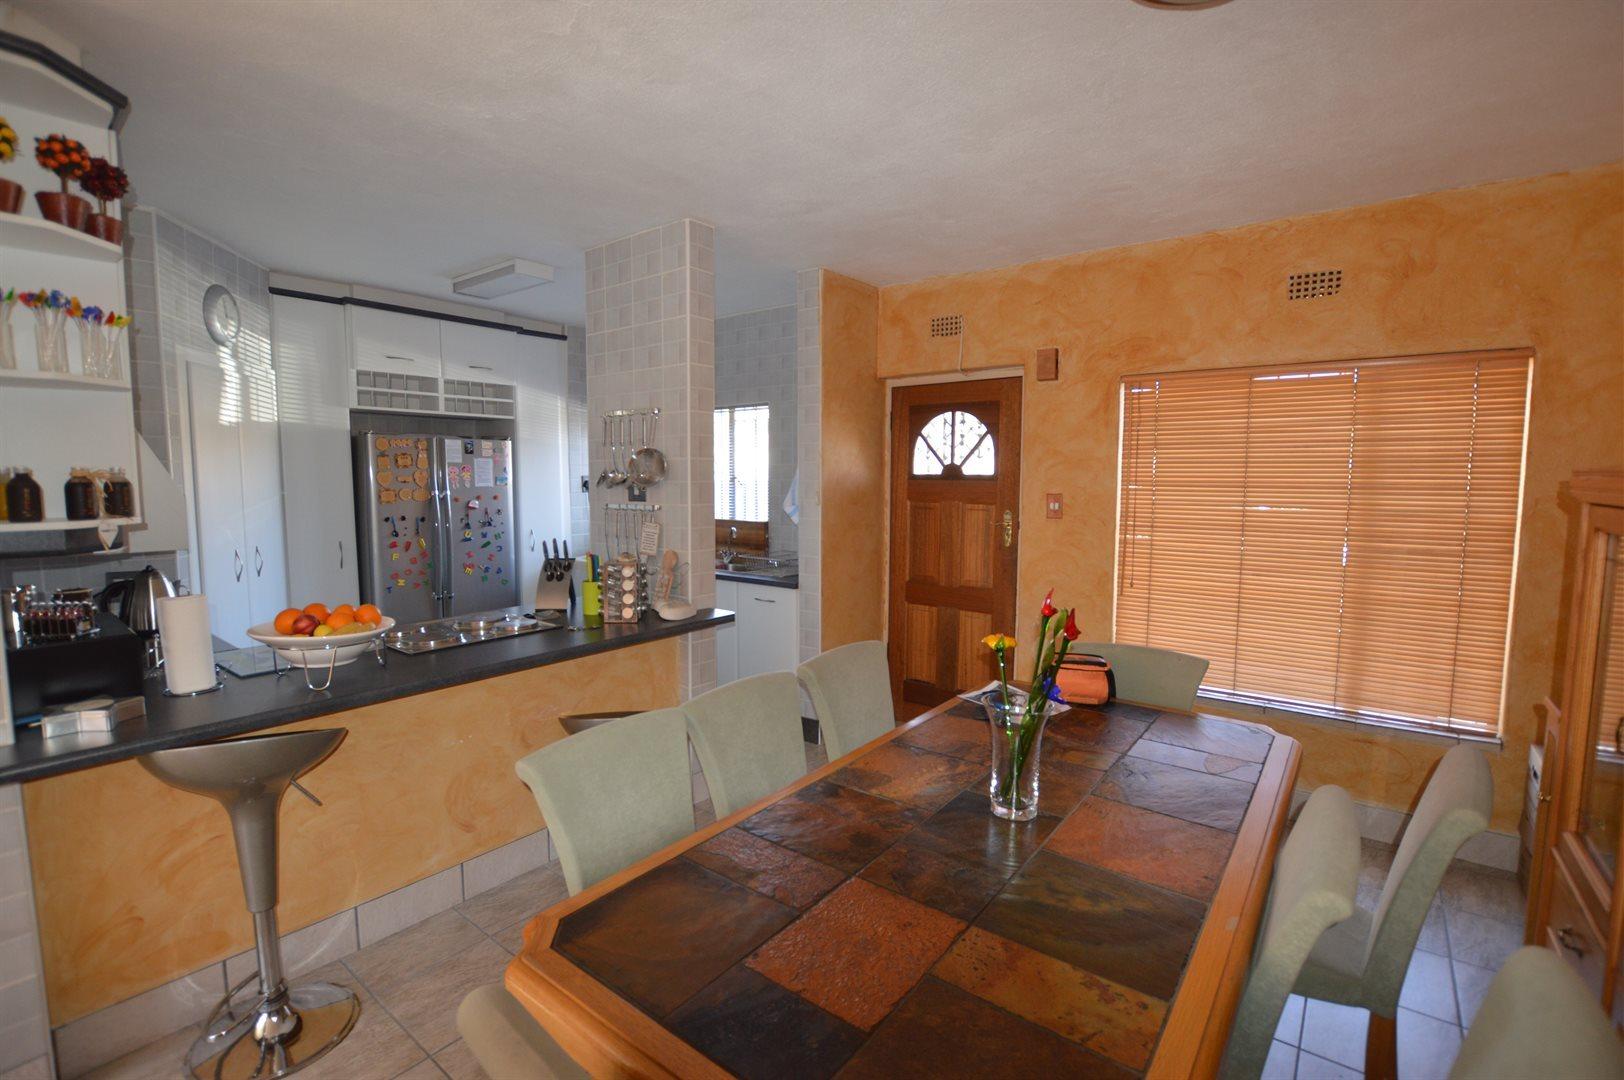 Sasolburg, Roodia Property  | Houses For Sale Roodia, Roodia, Apartment 2 bedrooms property for sale Price:899,000